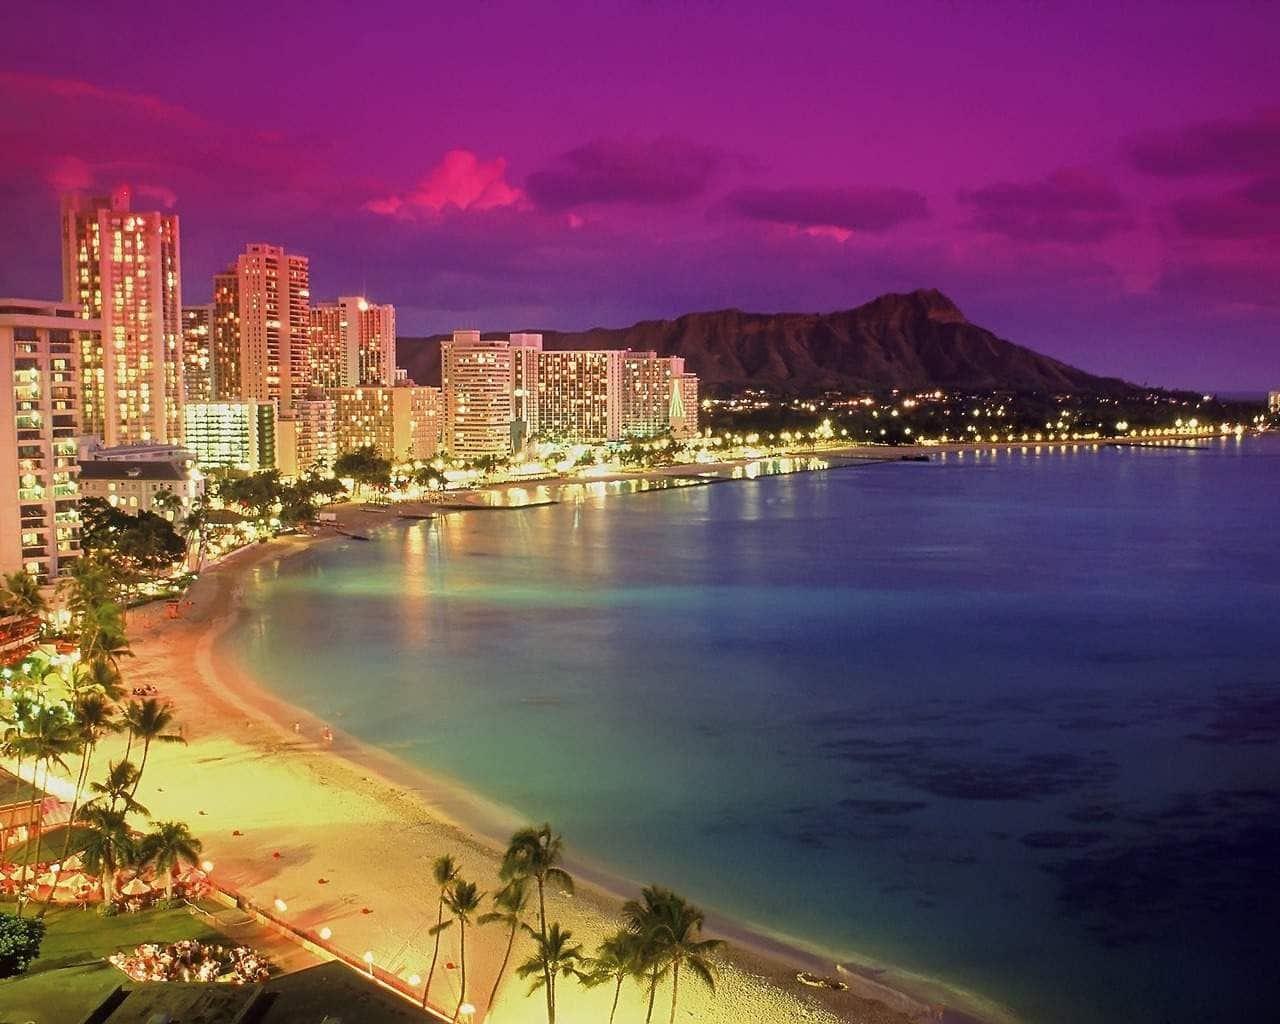 American beach - Waikiki Beach